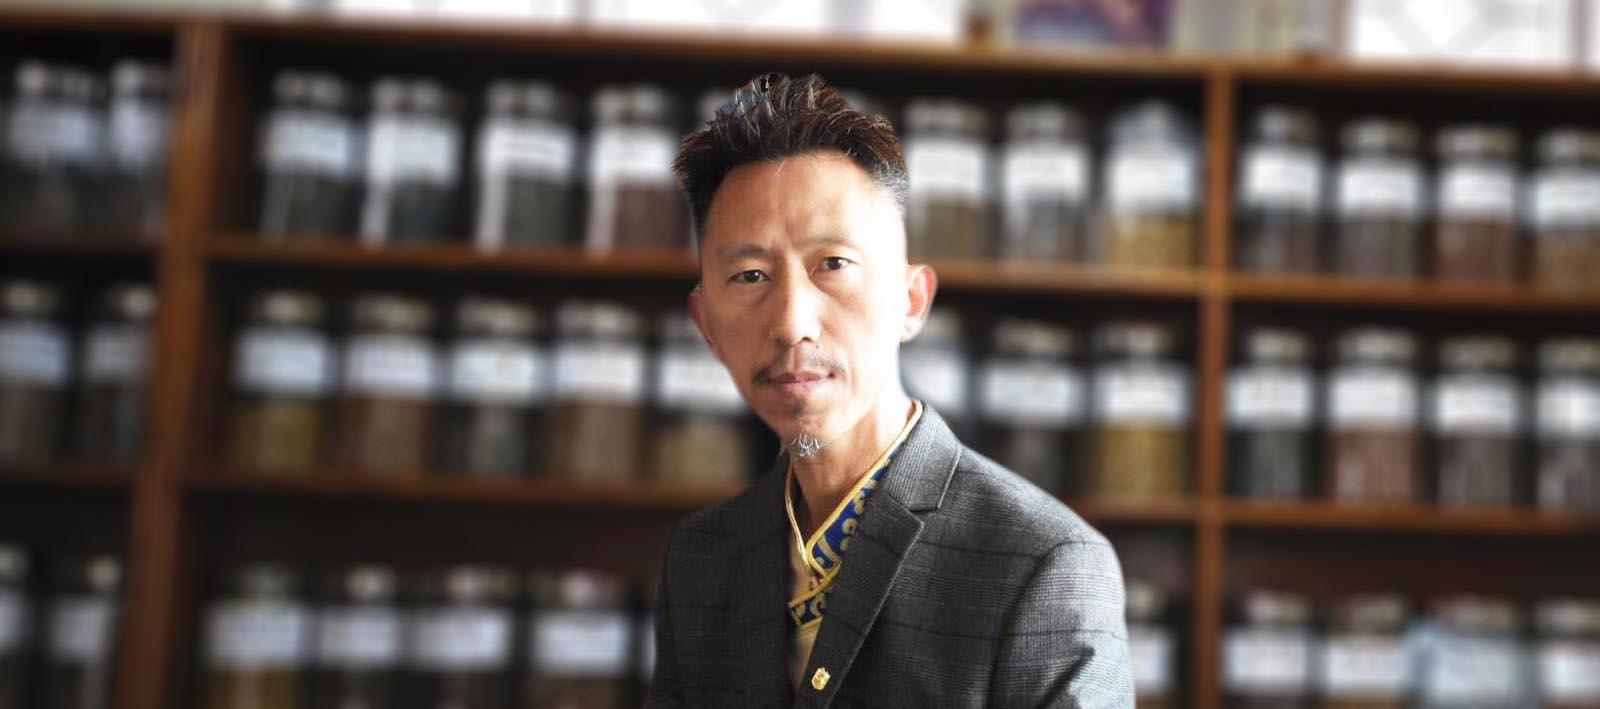 Dr. Tenzin Gelek Chukstang